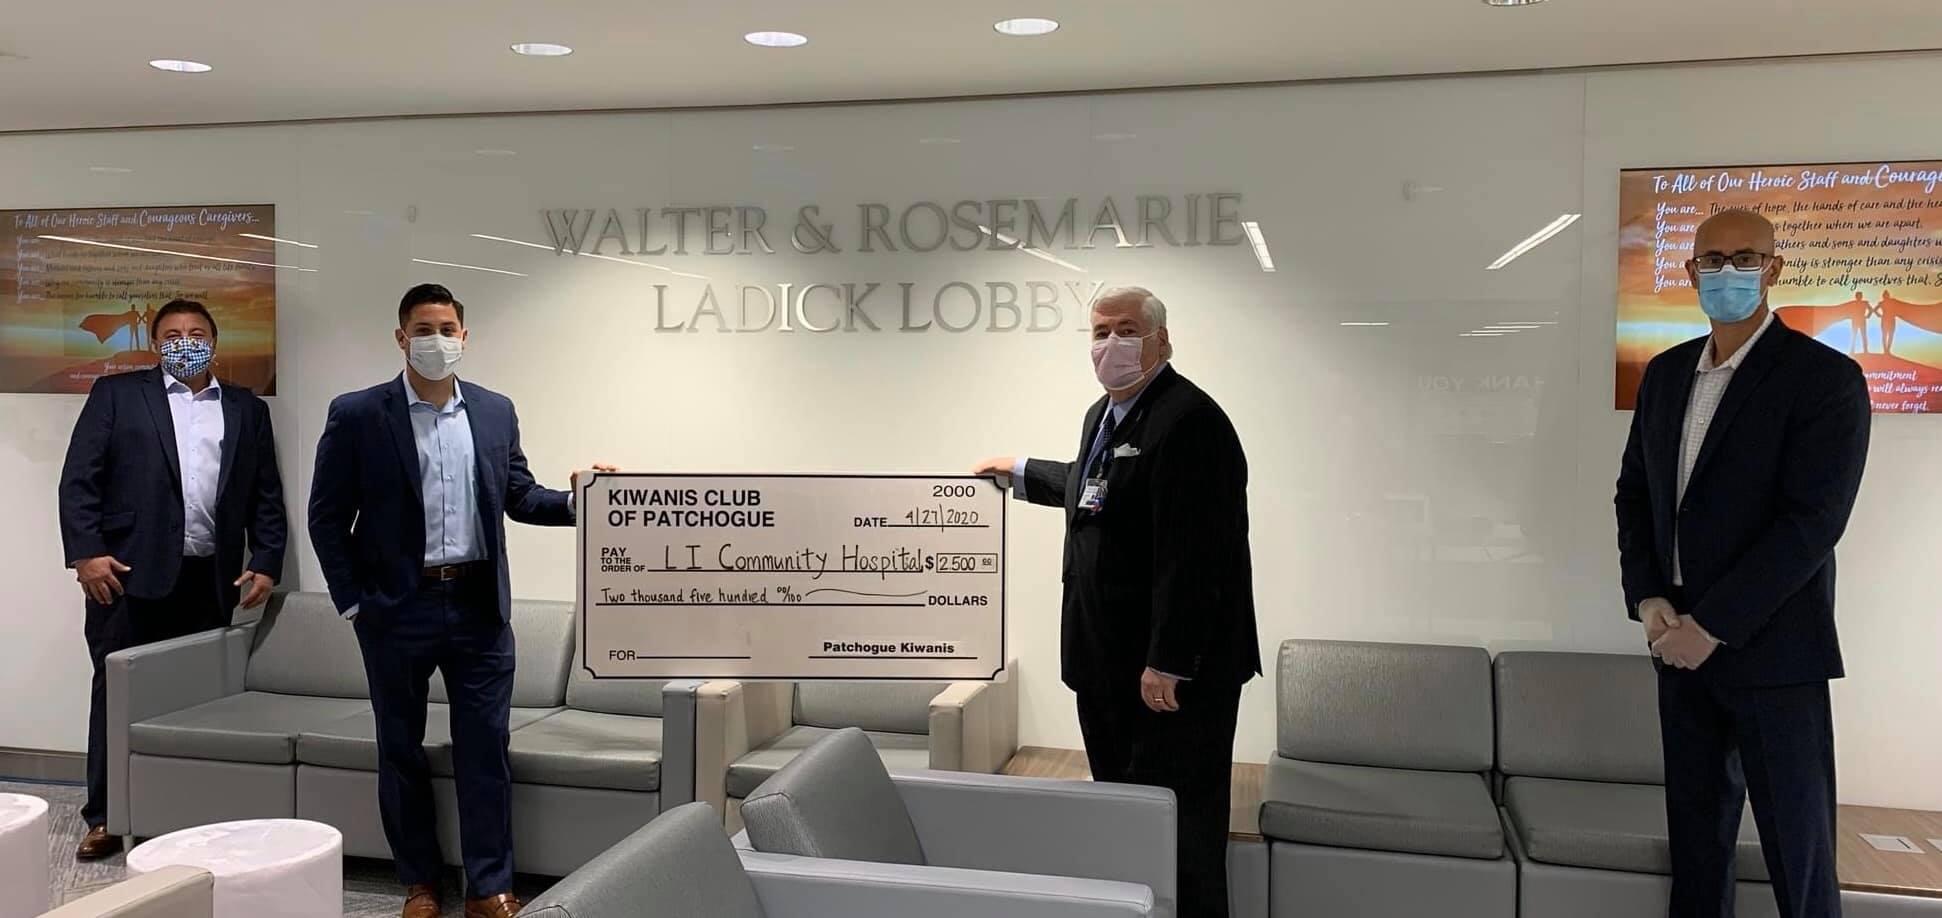 L I Community Hospital Donation